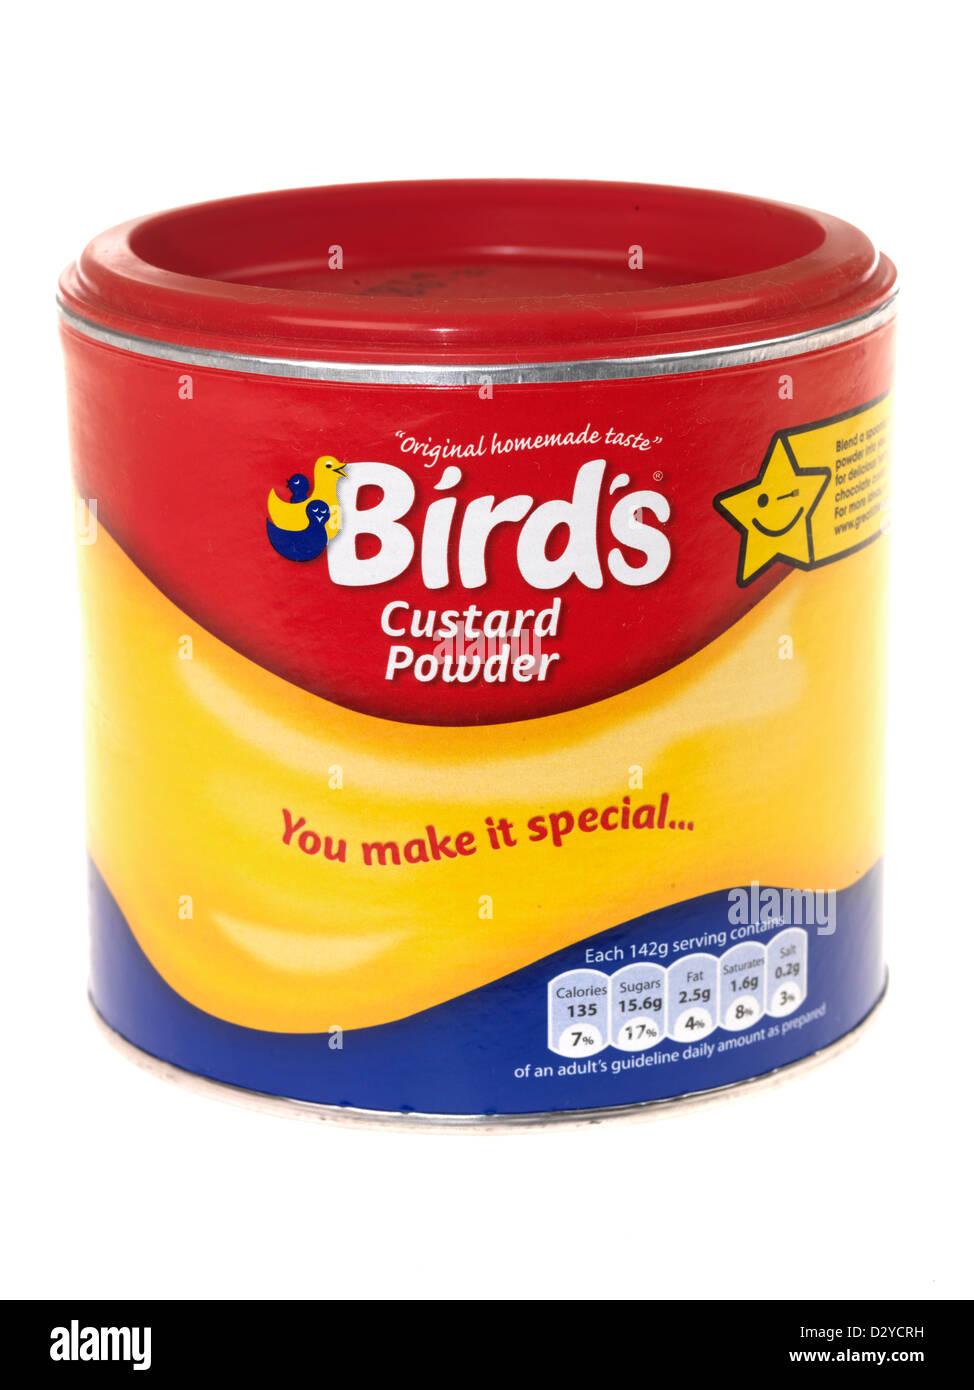 Custard Powder - Stock Image